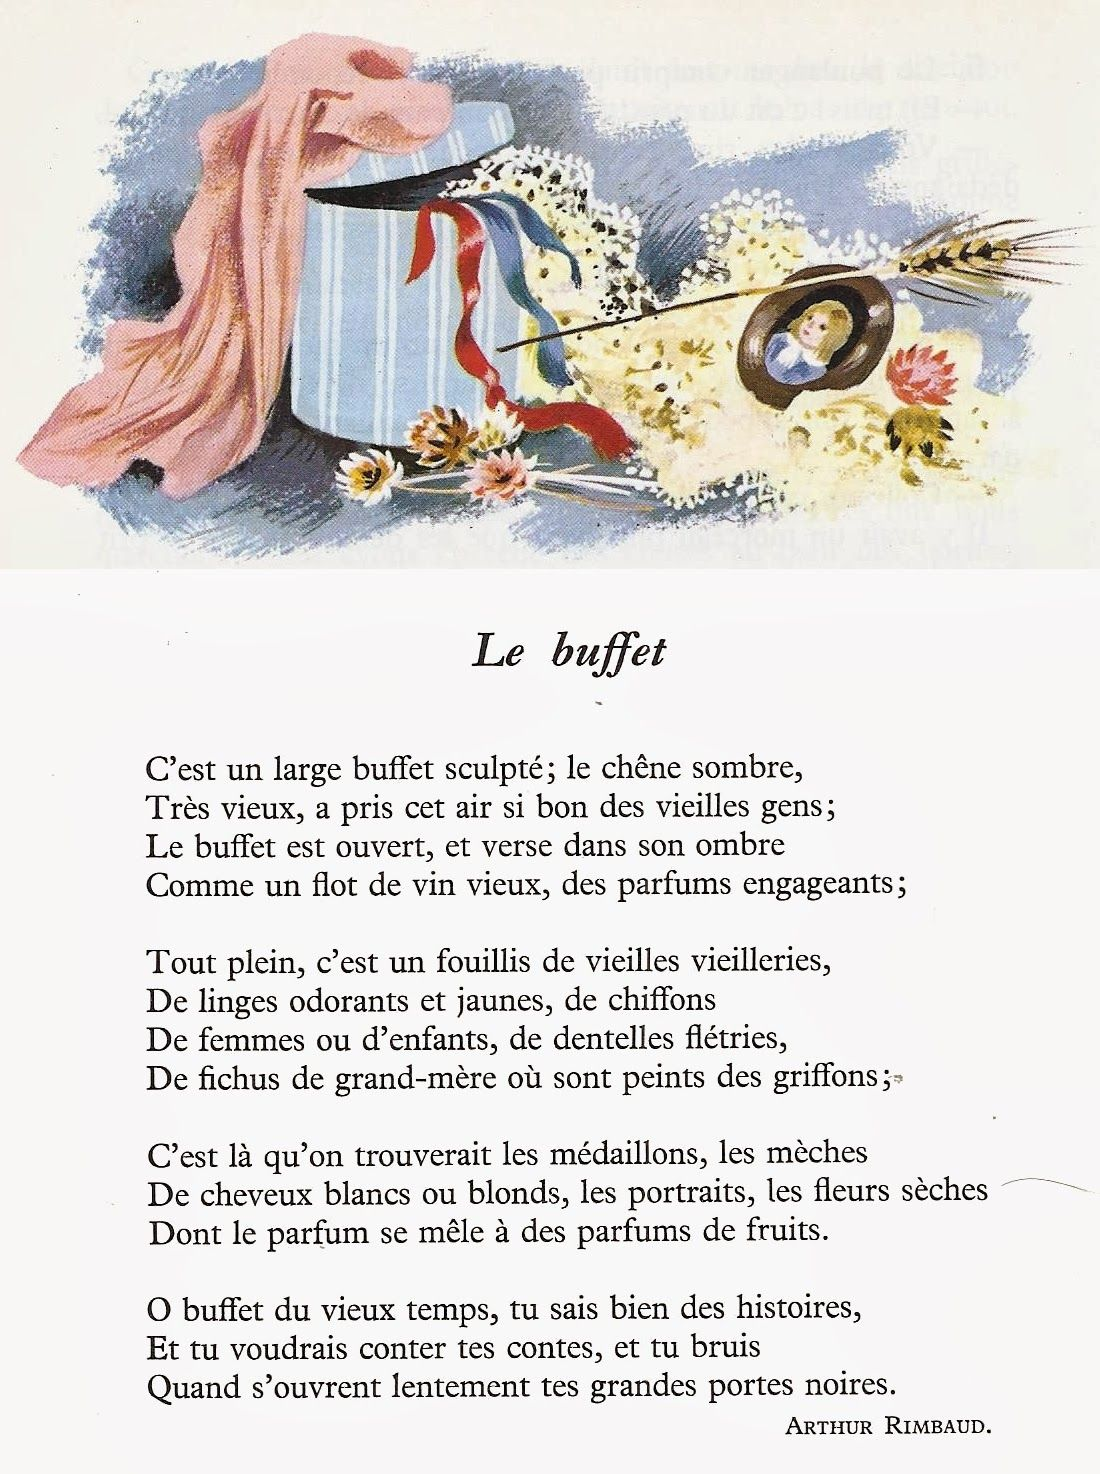 Le Buffet Arthur Rimbaud Poeme Francais Poesie Francaise Victor Hugo Poeme